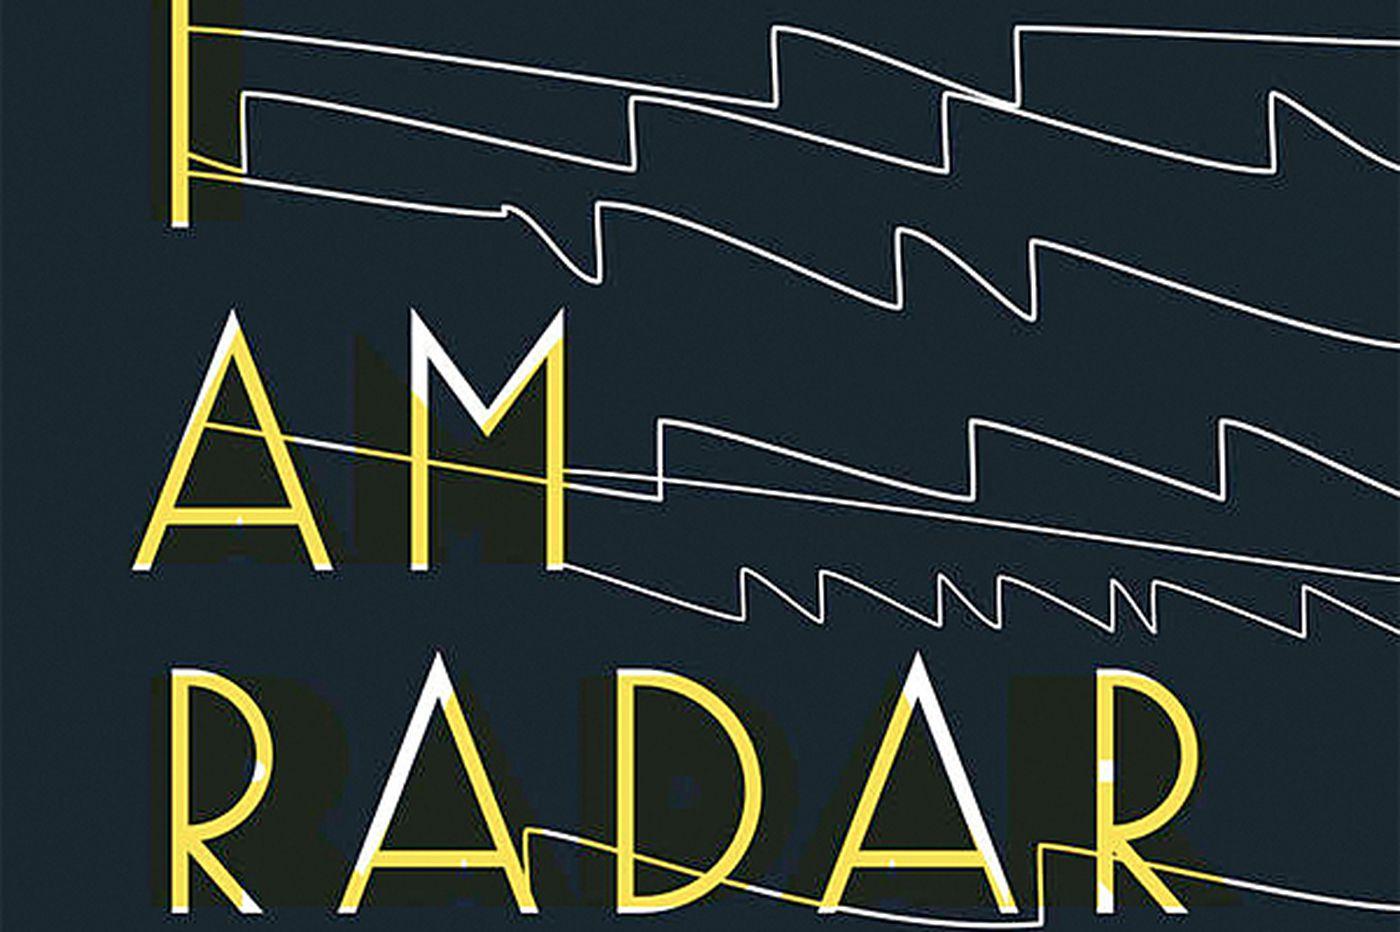 Reif Larsen's 'I Am Radar' is wacky, worthwhile